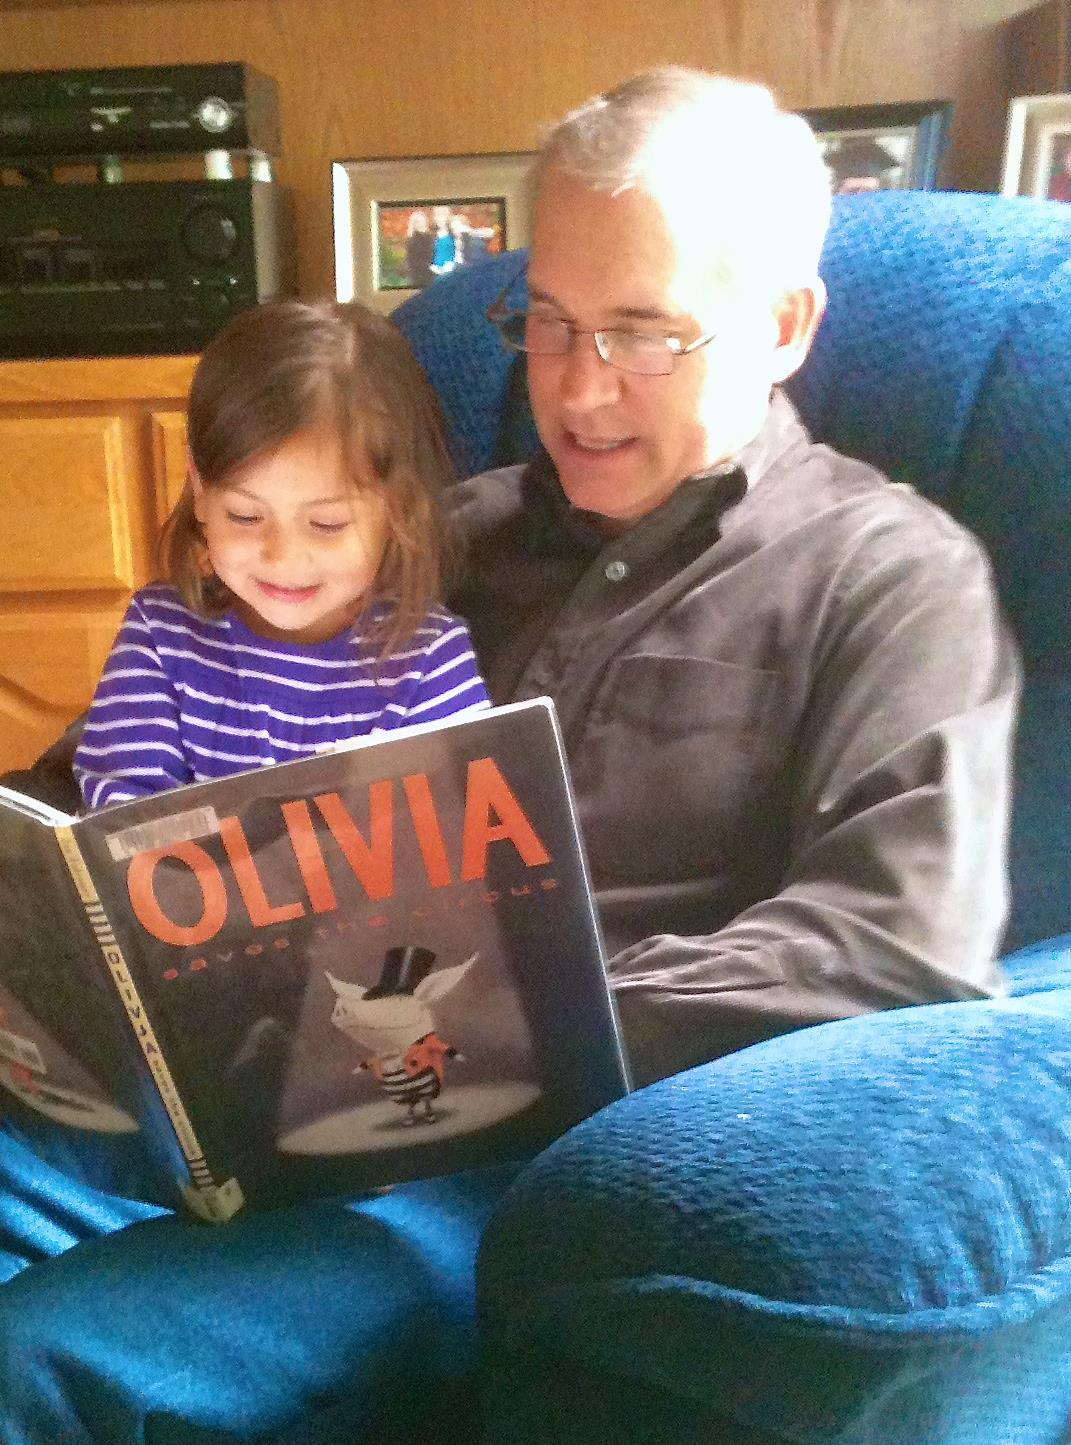 Grandpa granddaughter reading together.jpg